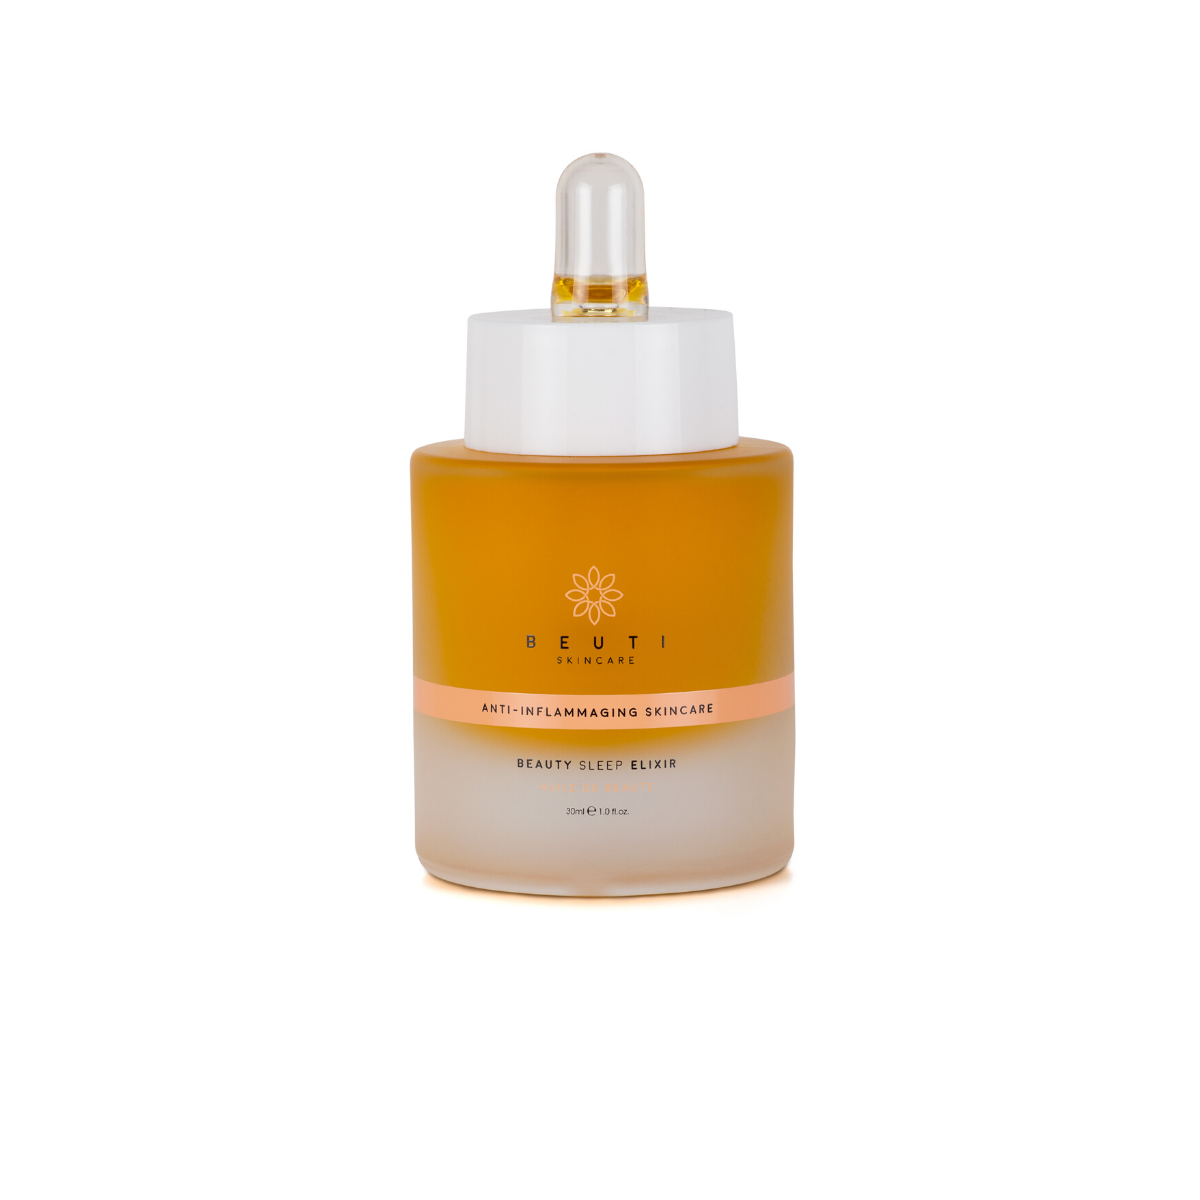 Beuti Beauty Sleep Elixir Beauty Skin Care Skin Care Facial Oil